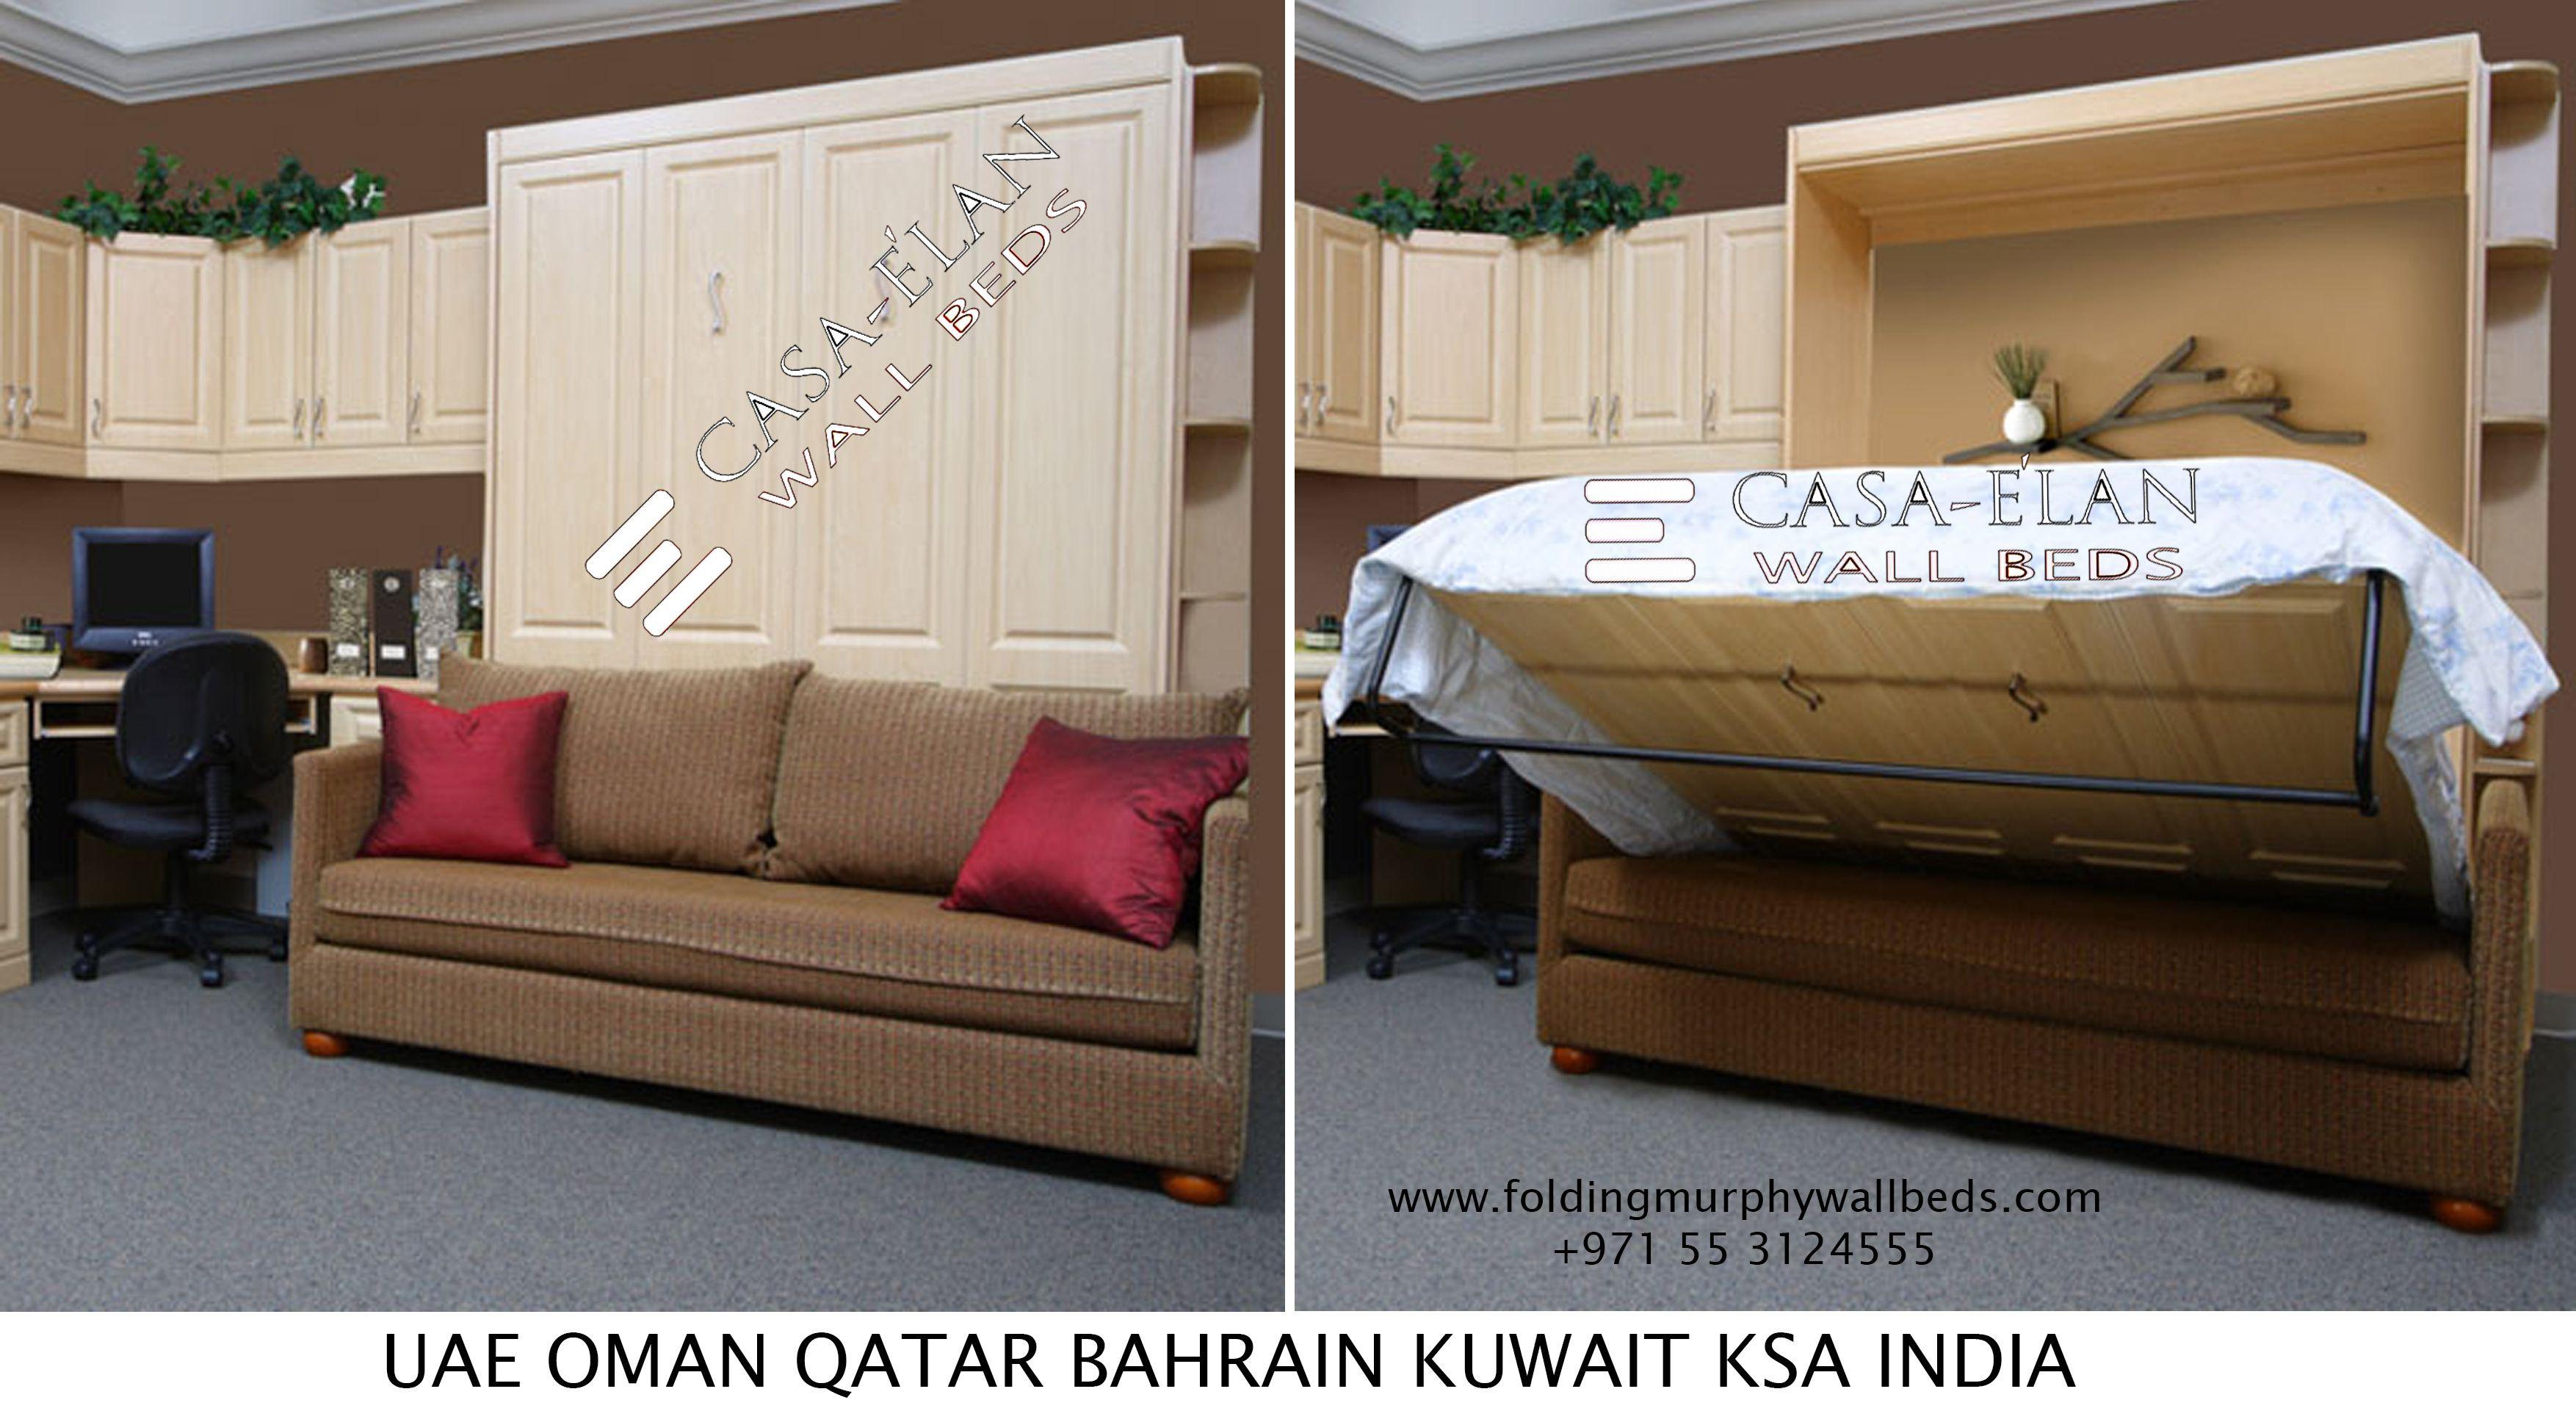 Pin by casaelan dubai on murphy folding wall beds in